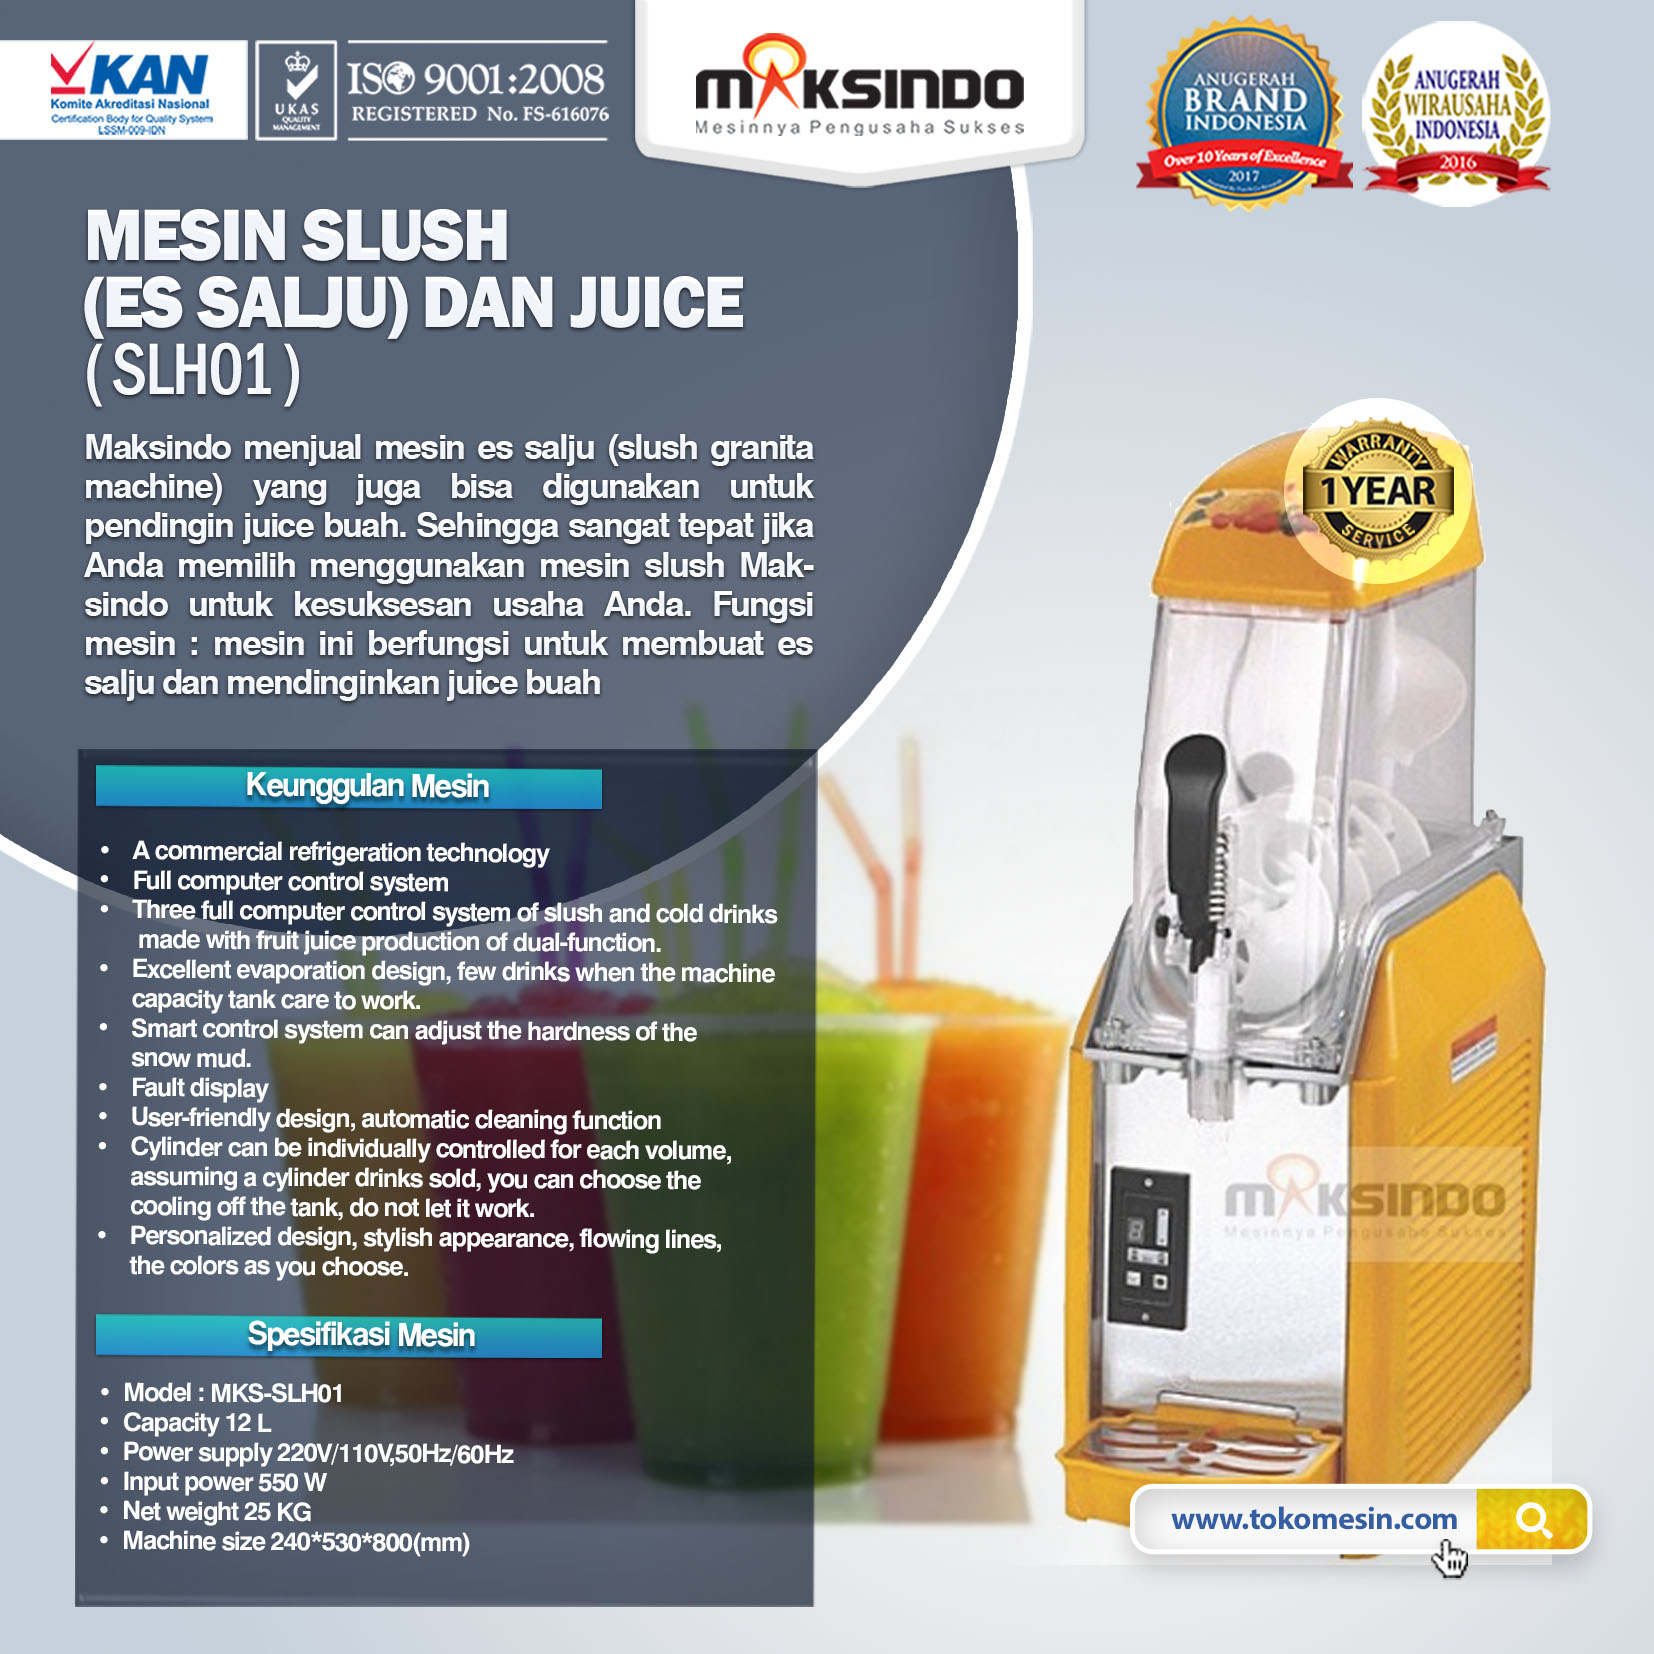 Mesin Slush (Es Salju) dan Juice – SLH01